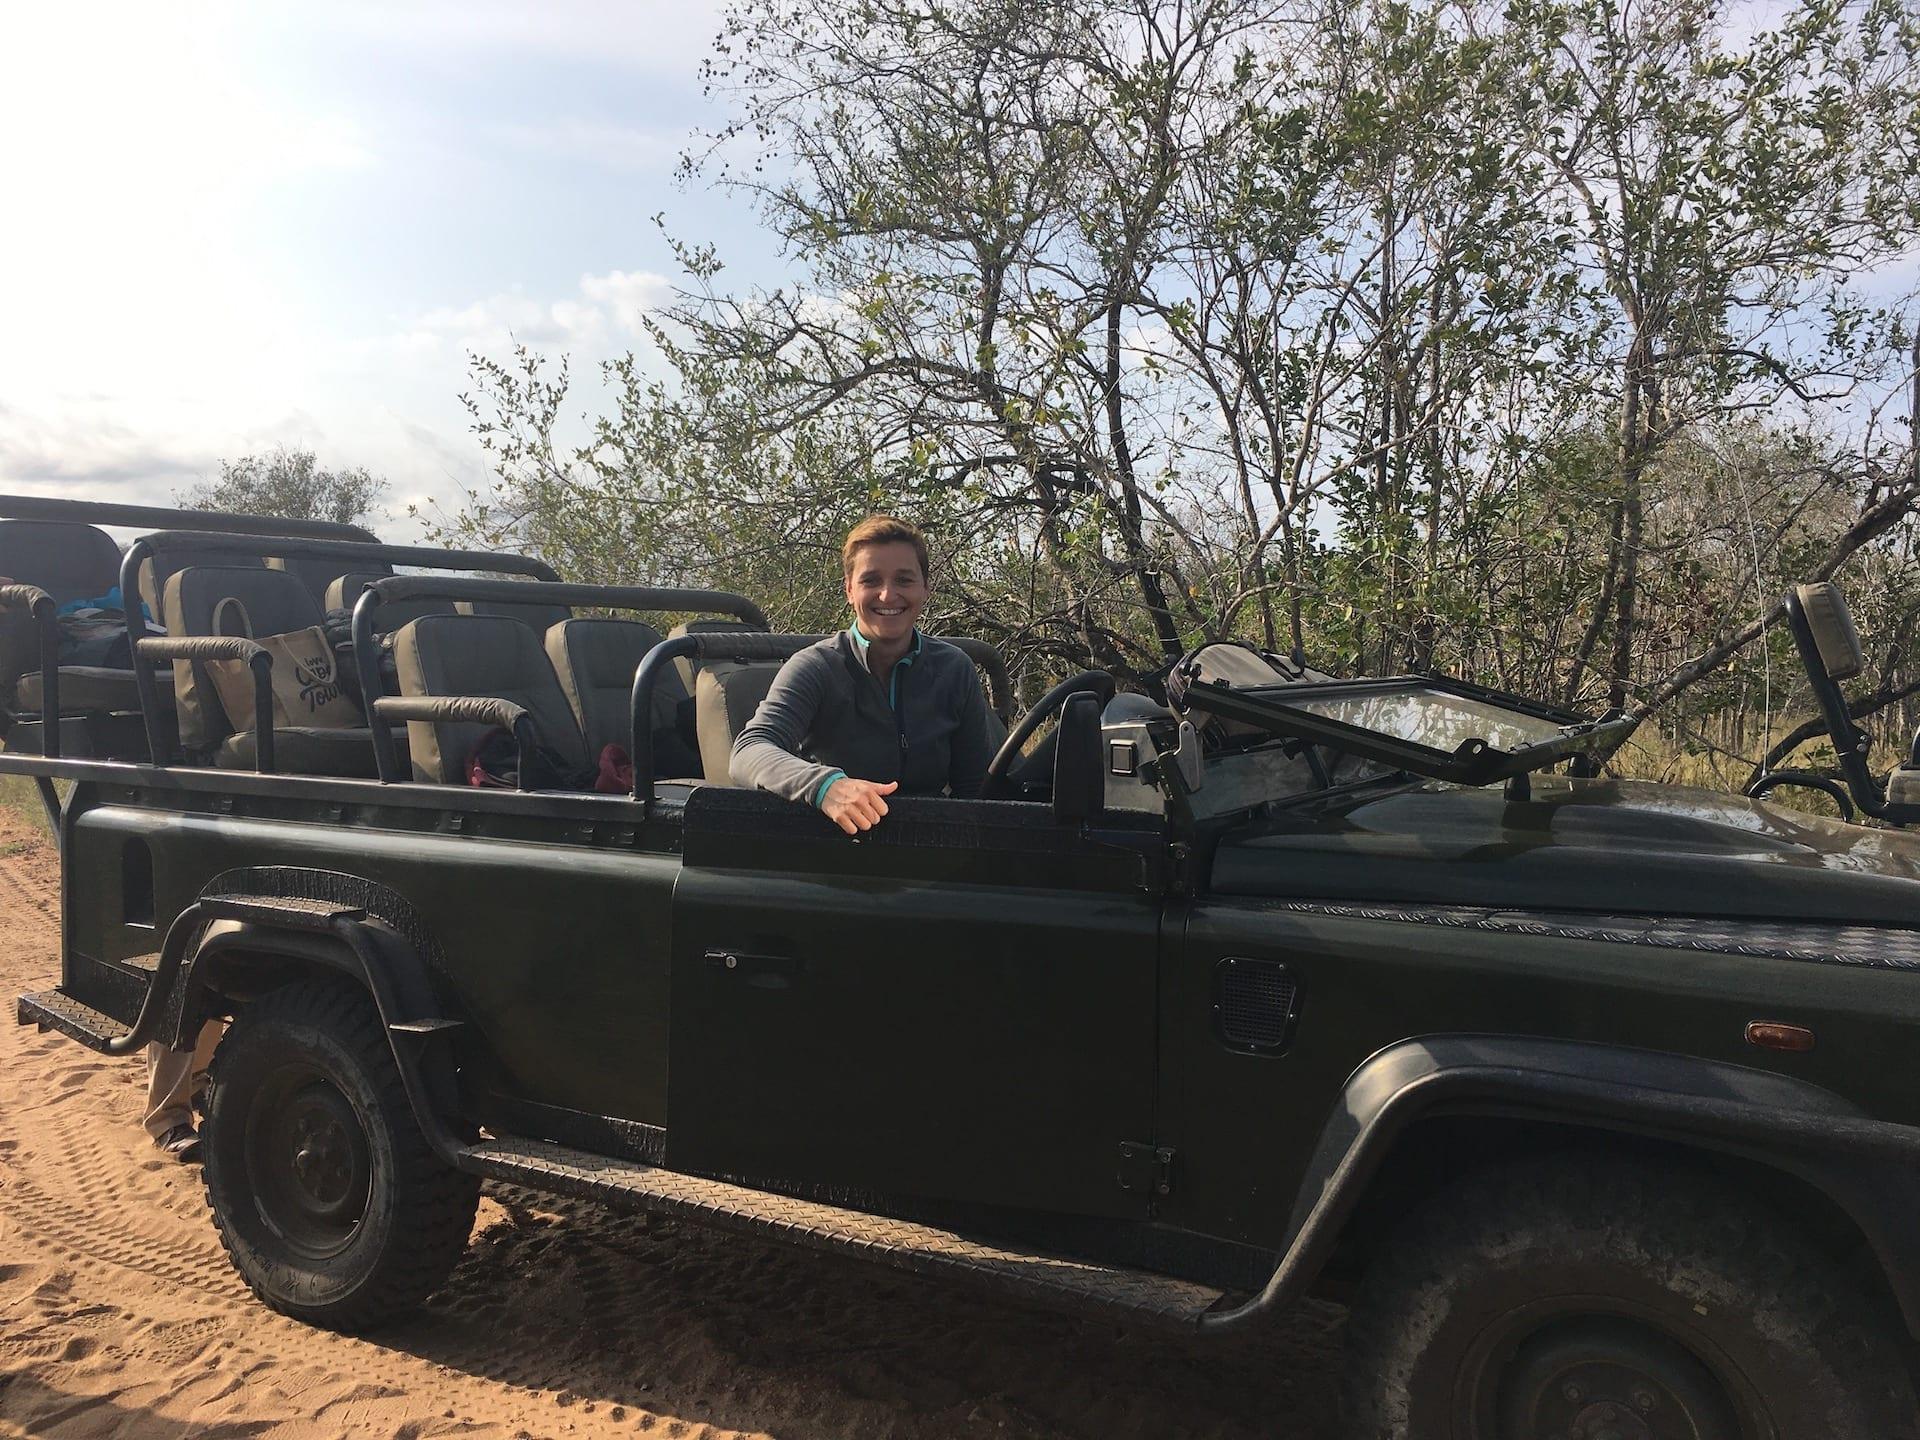 # FOTO - open safari voertuig - ZA - 2017 - IMG_5615